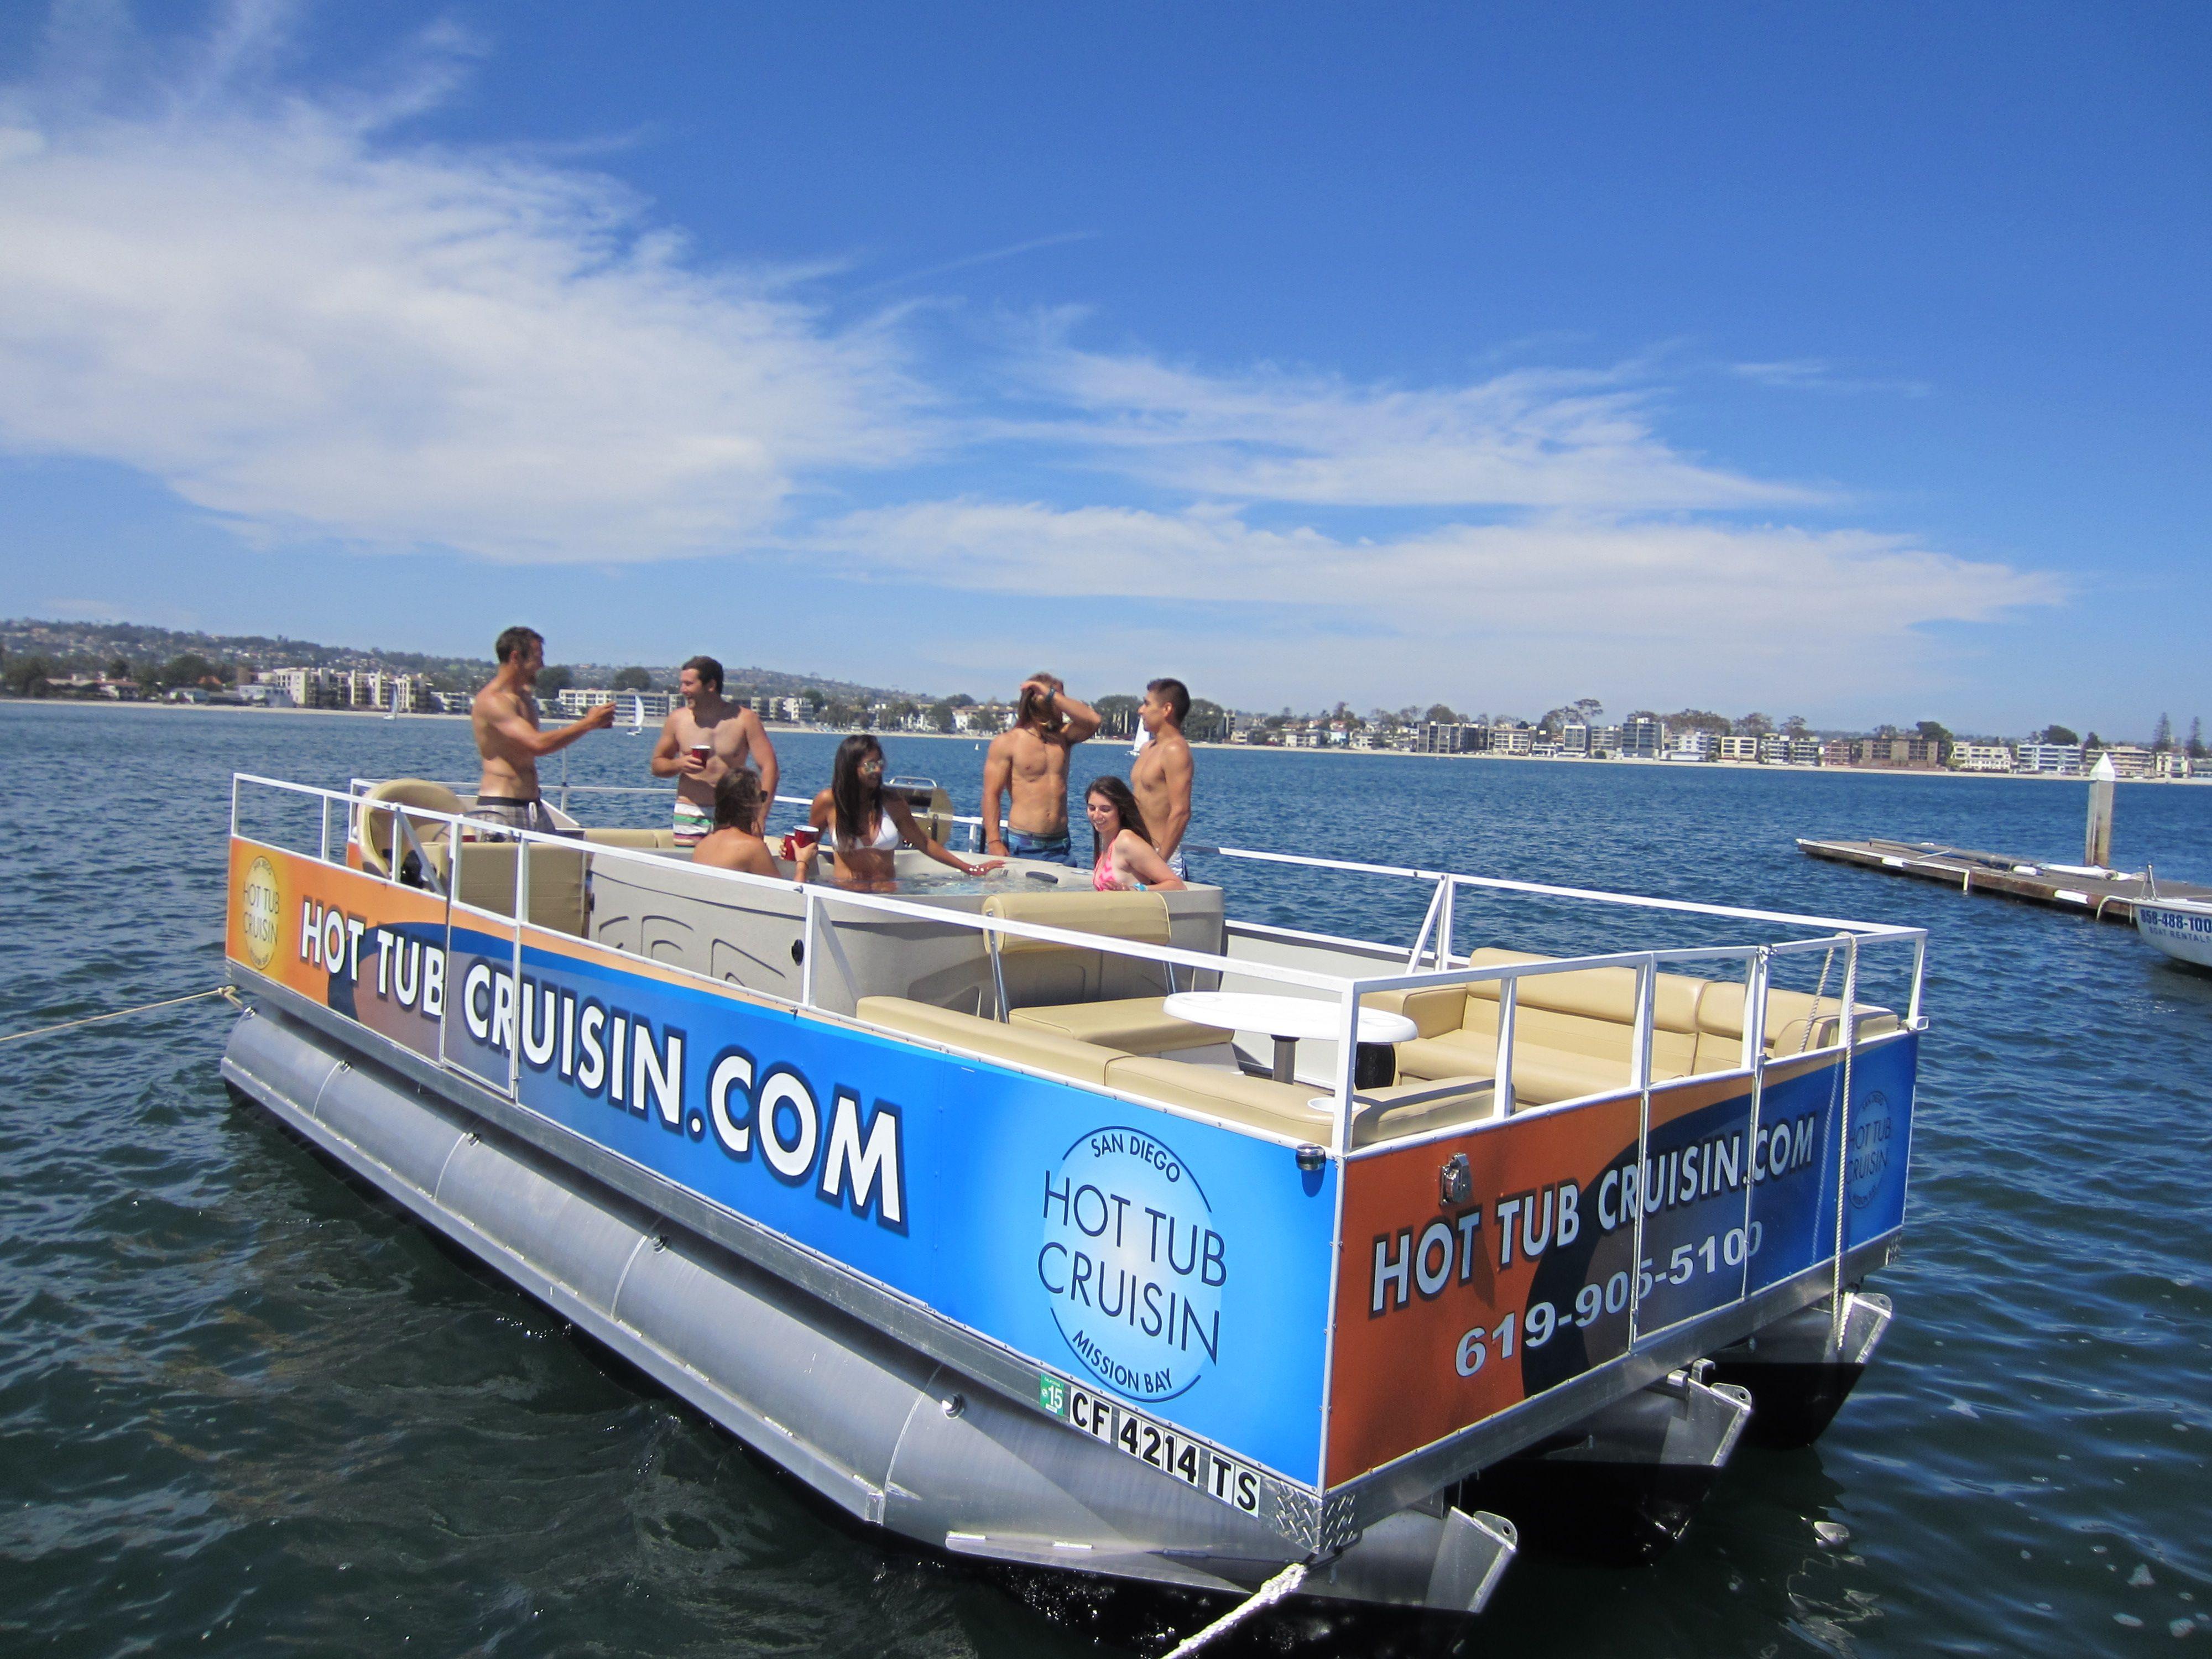 399 For Three Hour Hot Tub Cruisin Boat Rental Cruisin Boat Rental Hot Tub